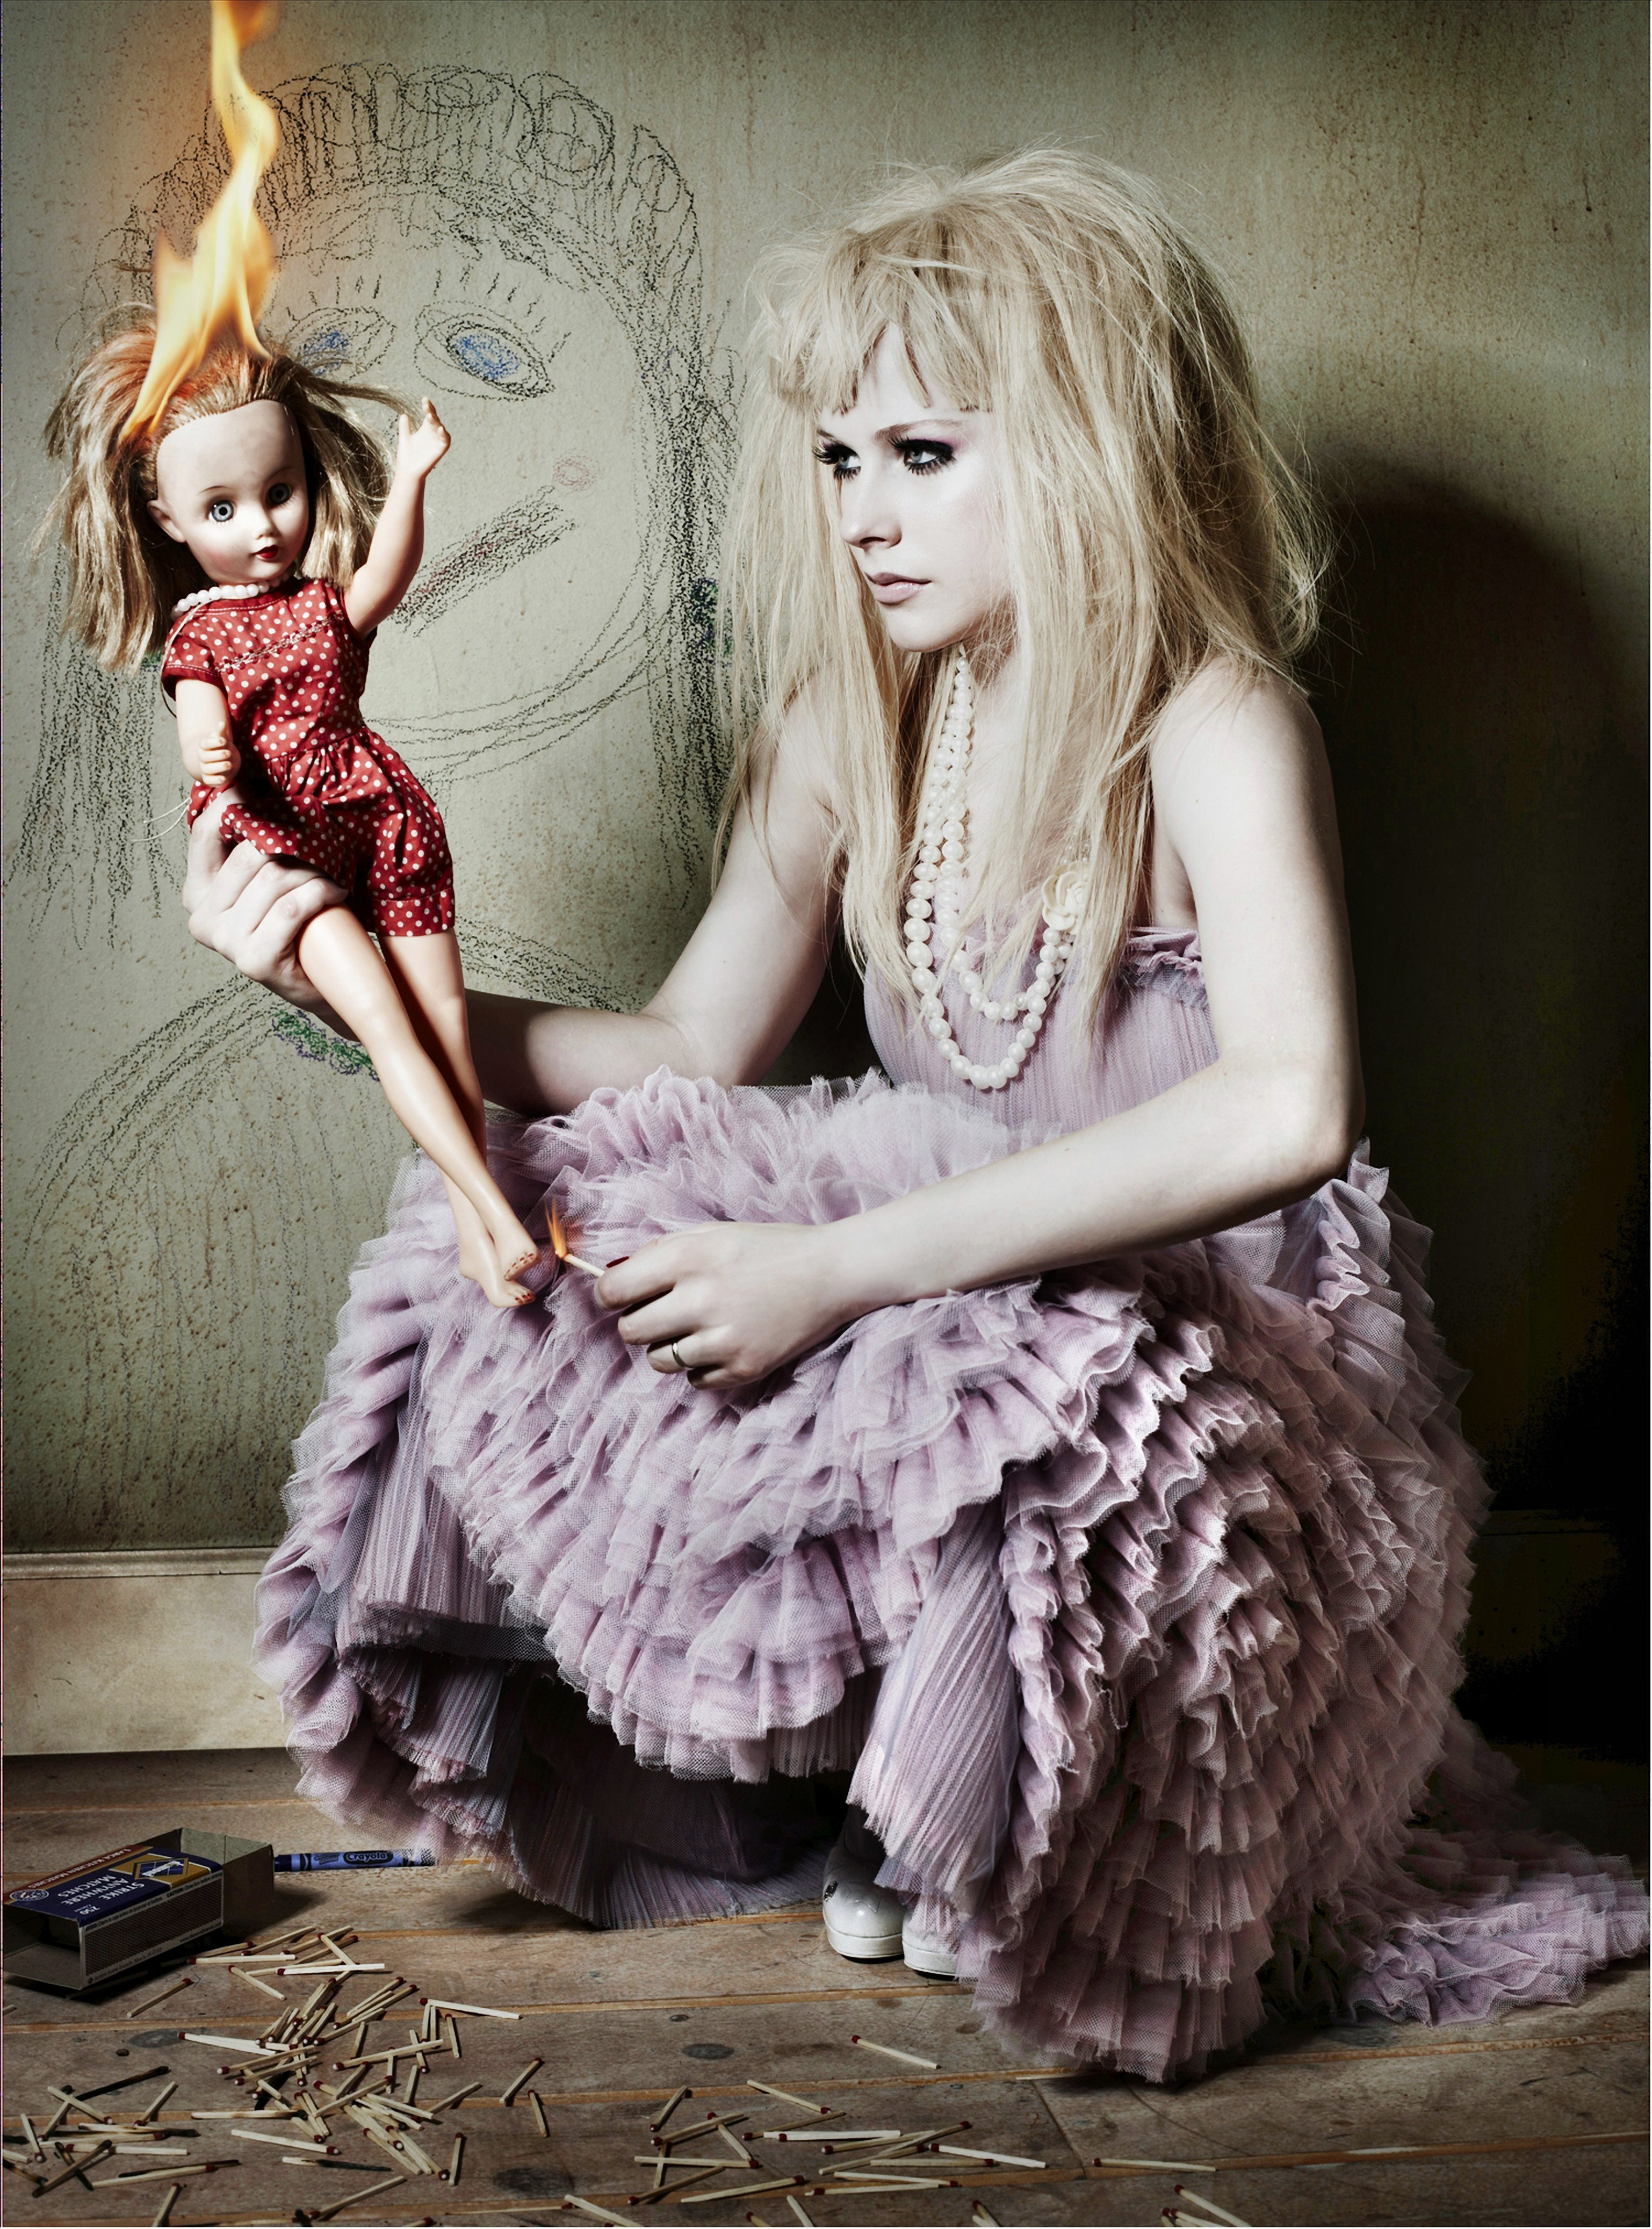 Съемка для куколда 11 фотография